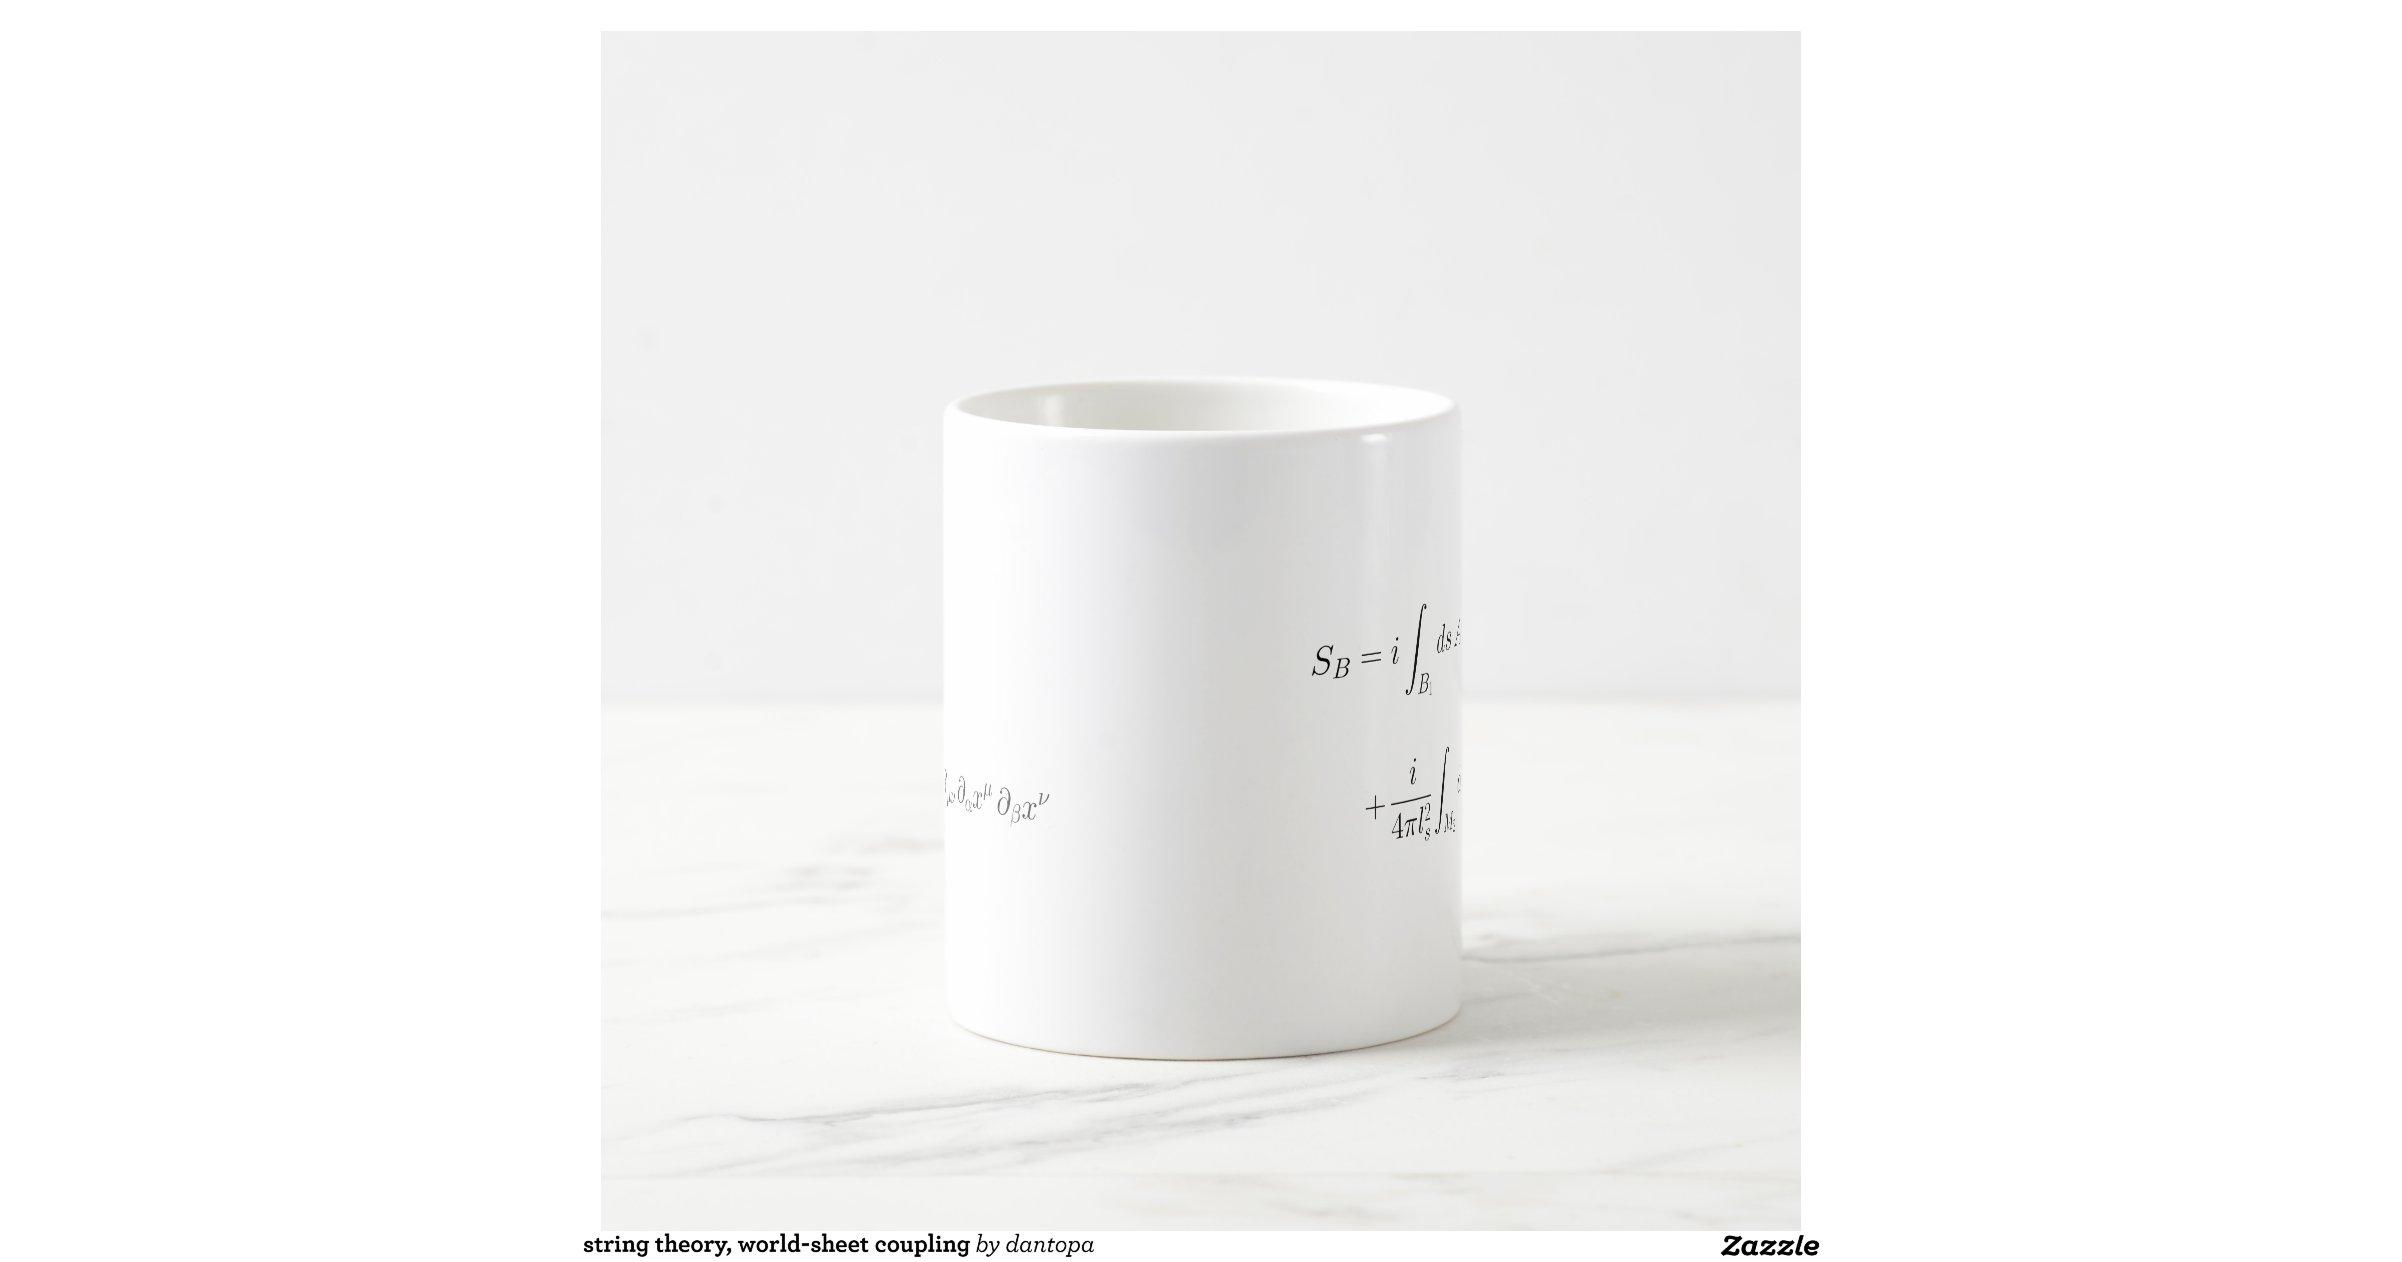 World String String Theory World-sheet